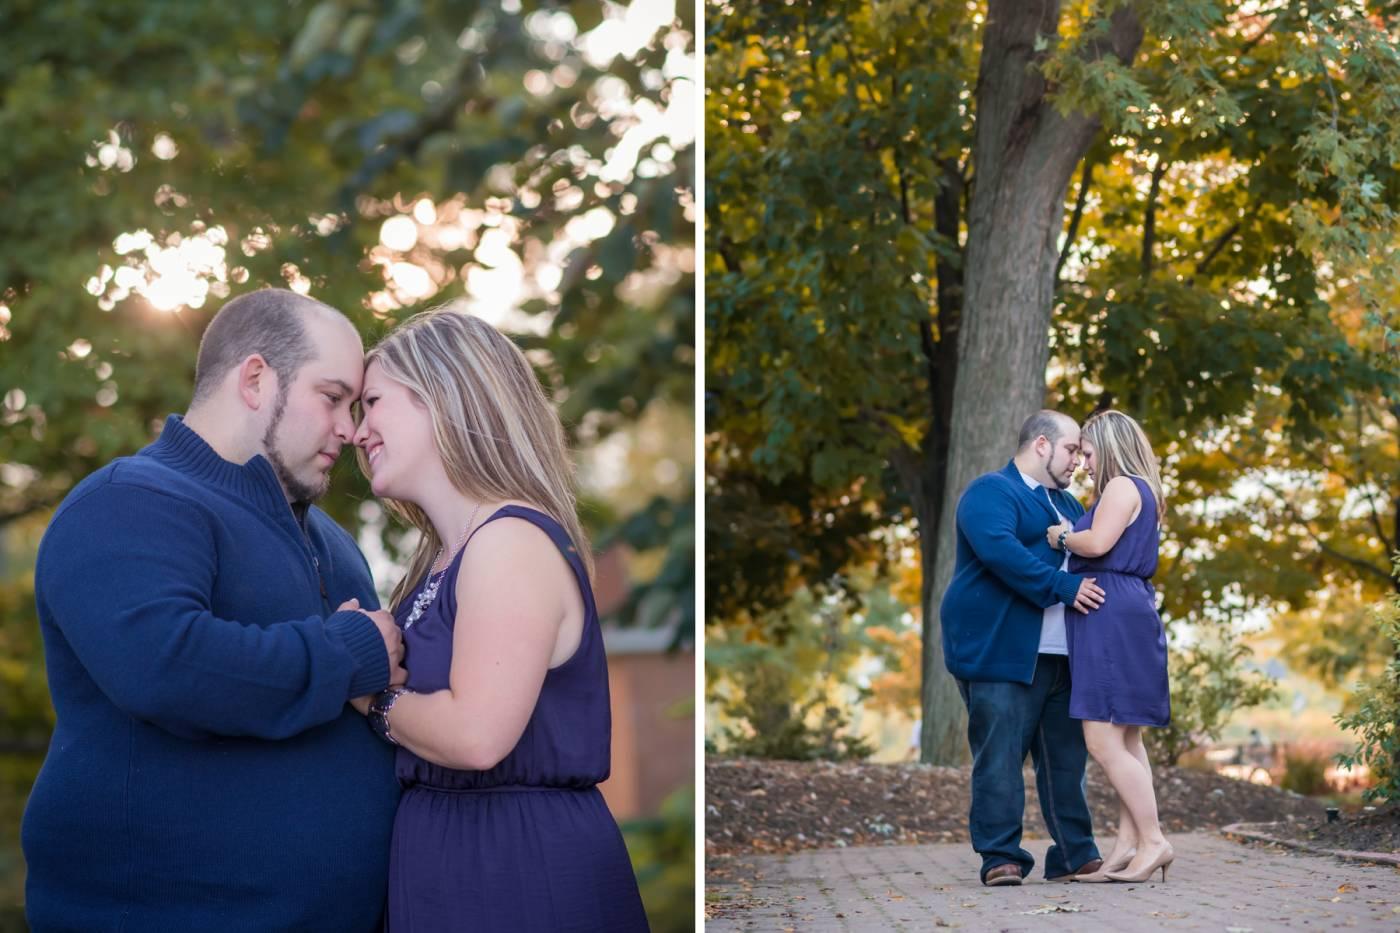 Tanya Sinnett Engagement Photography